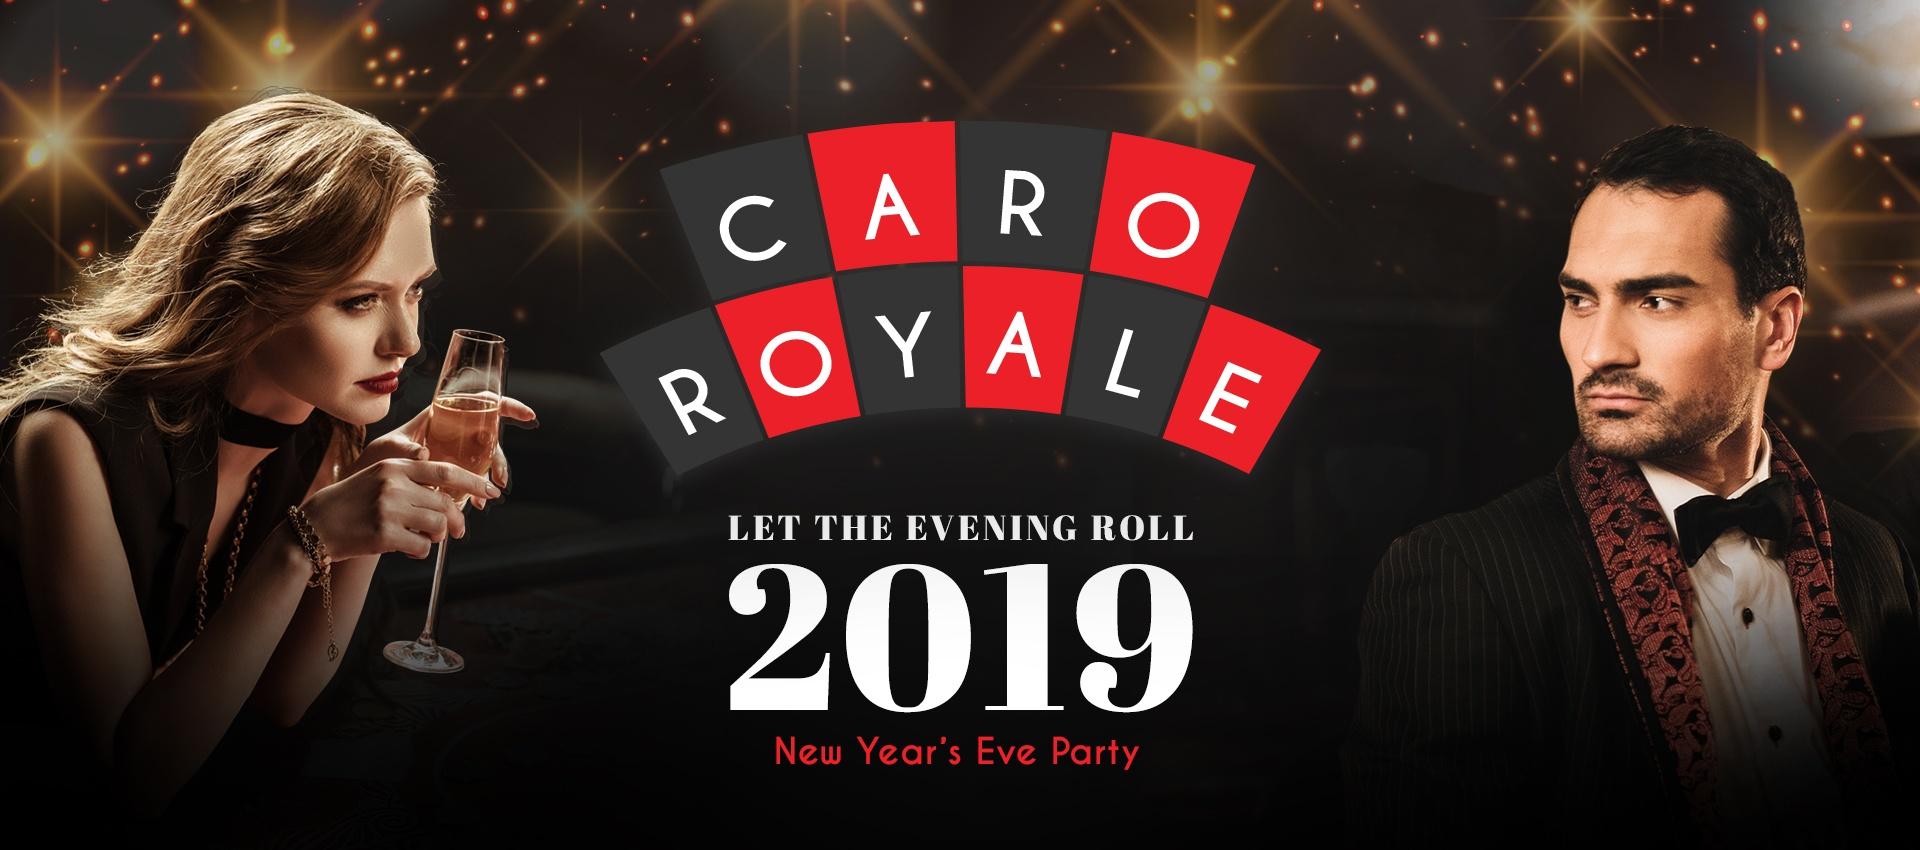 Revelion 2019 - Hotel Caro